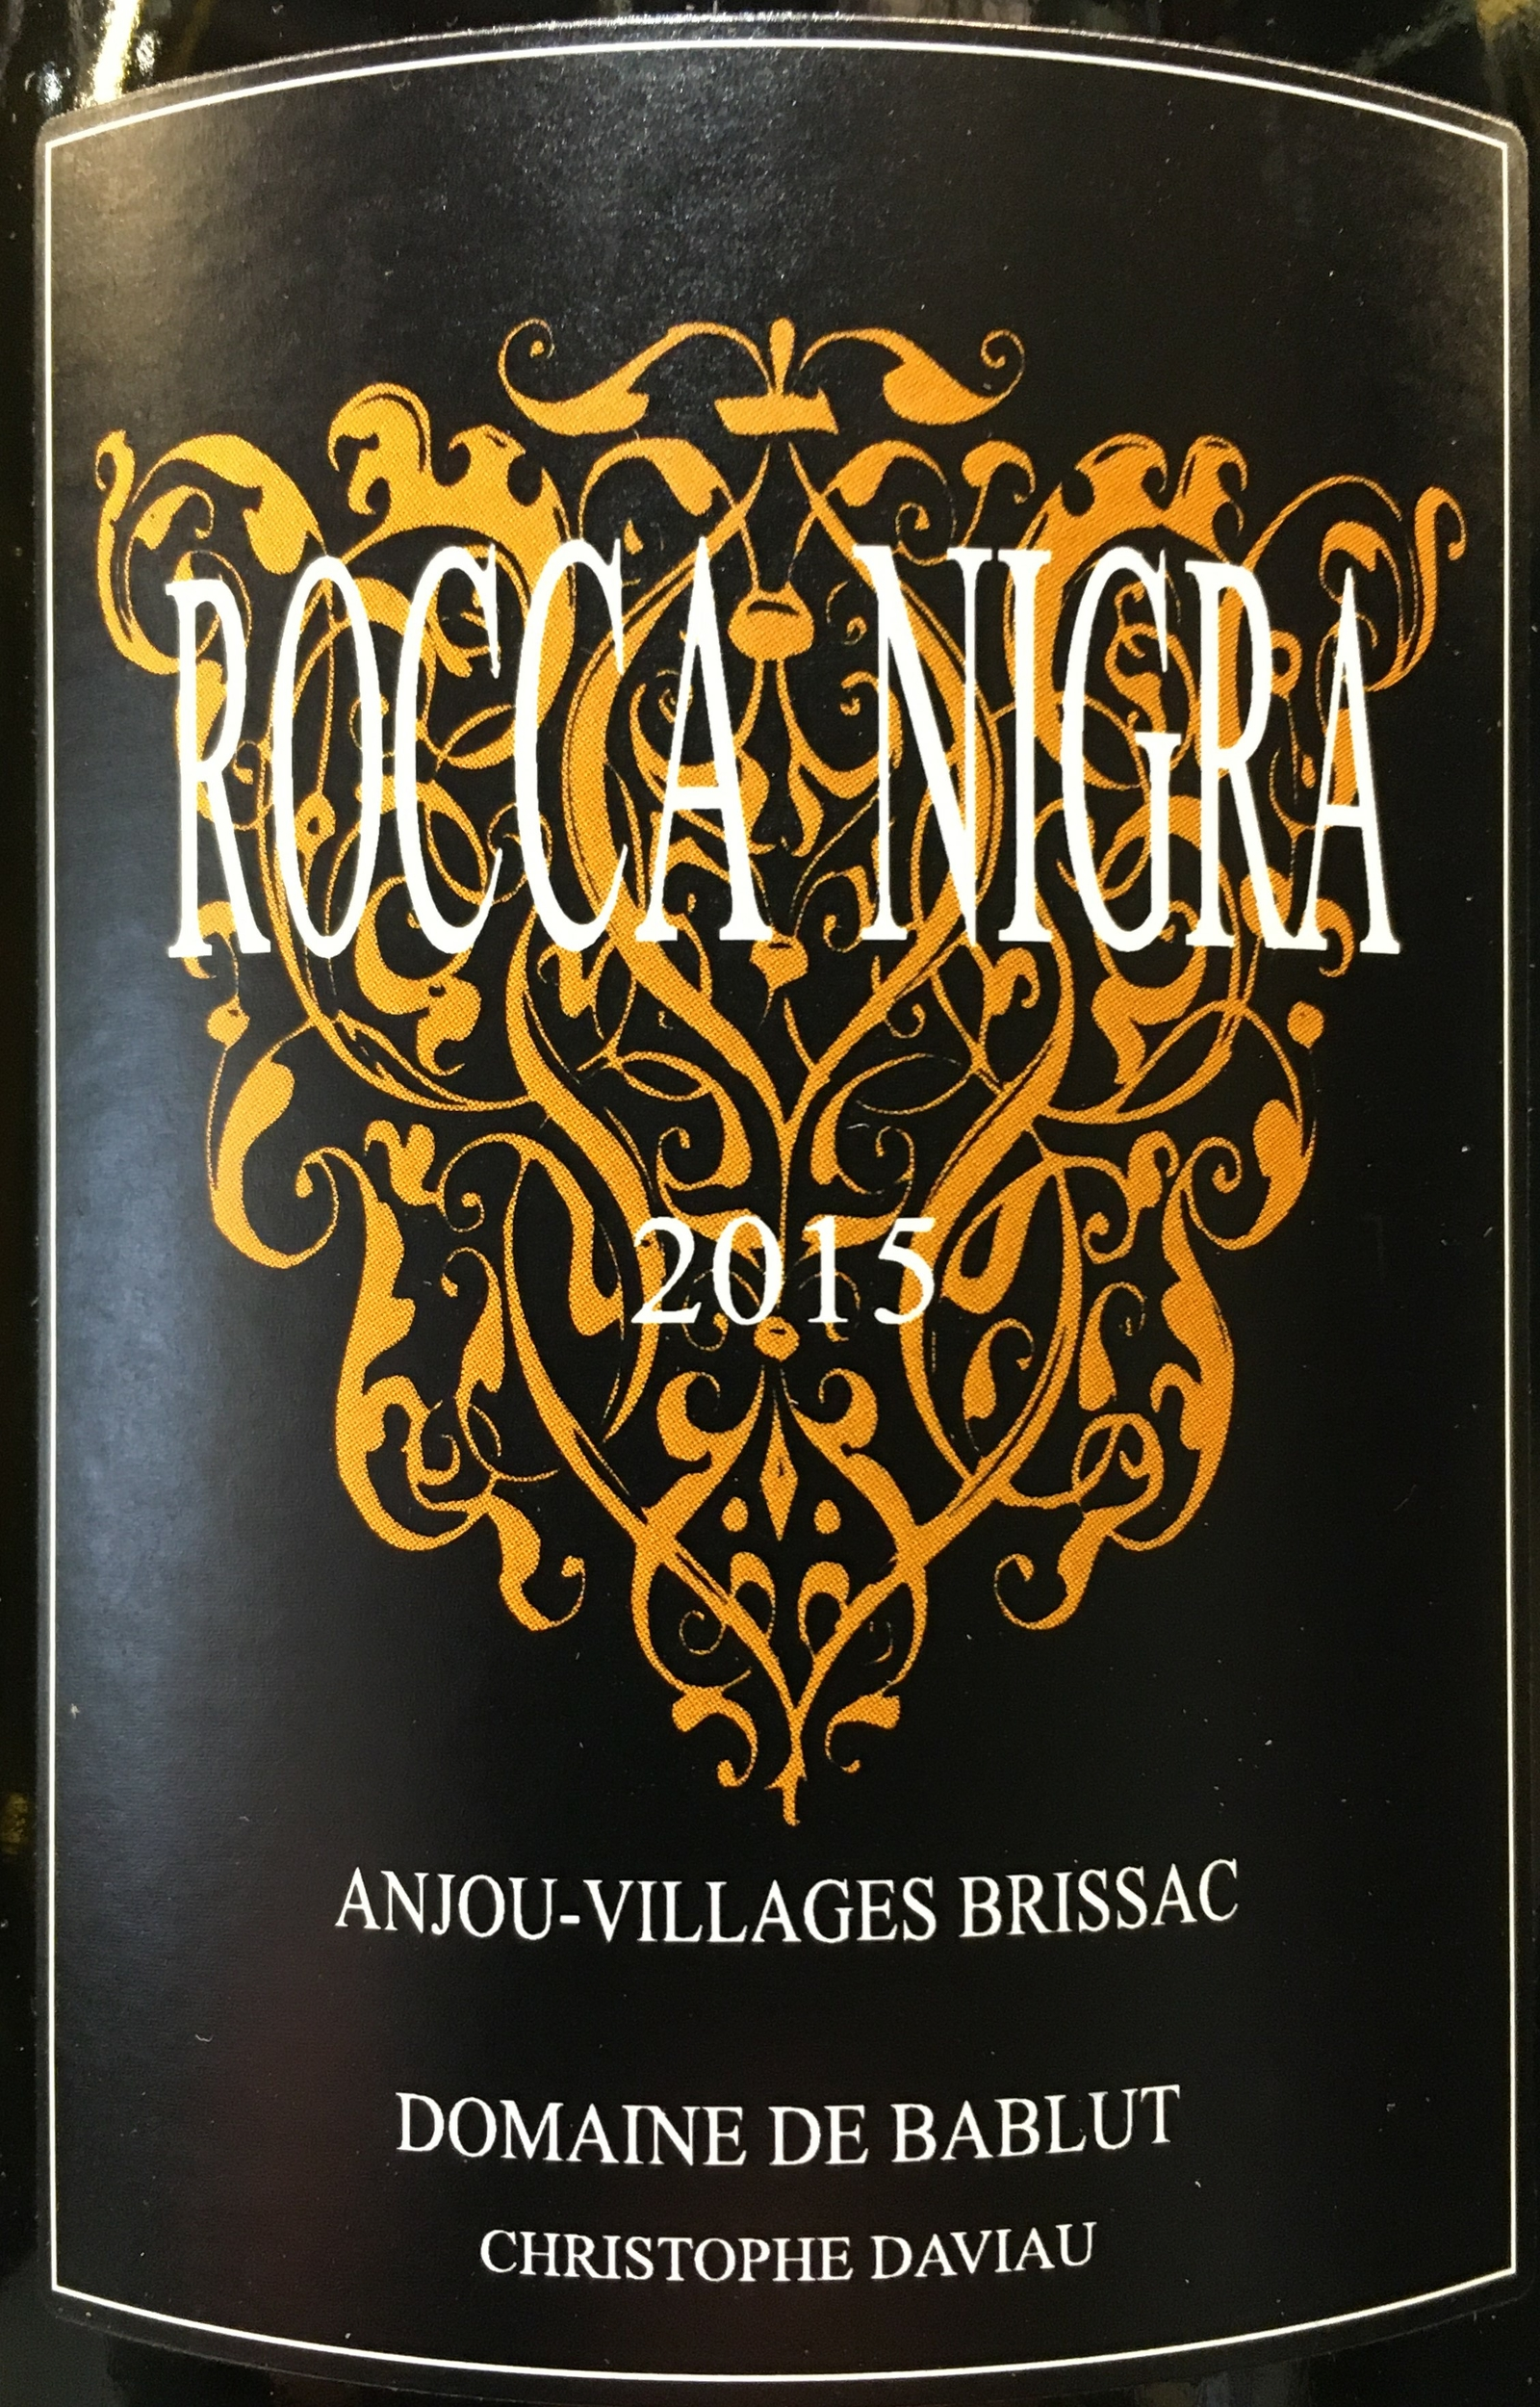 Rocca Nigra